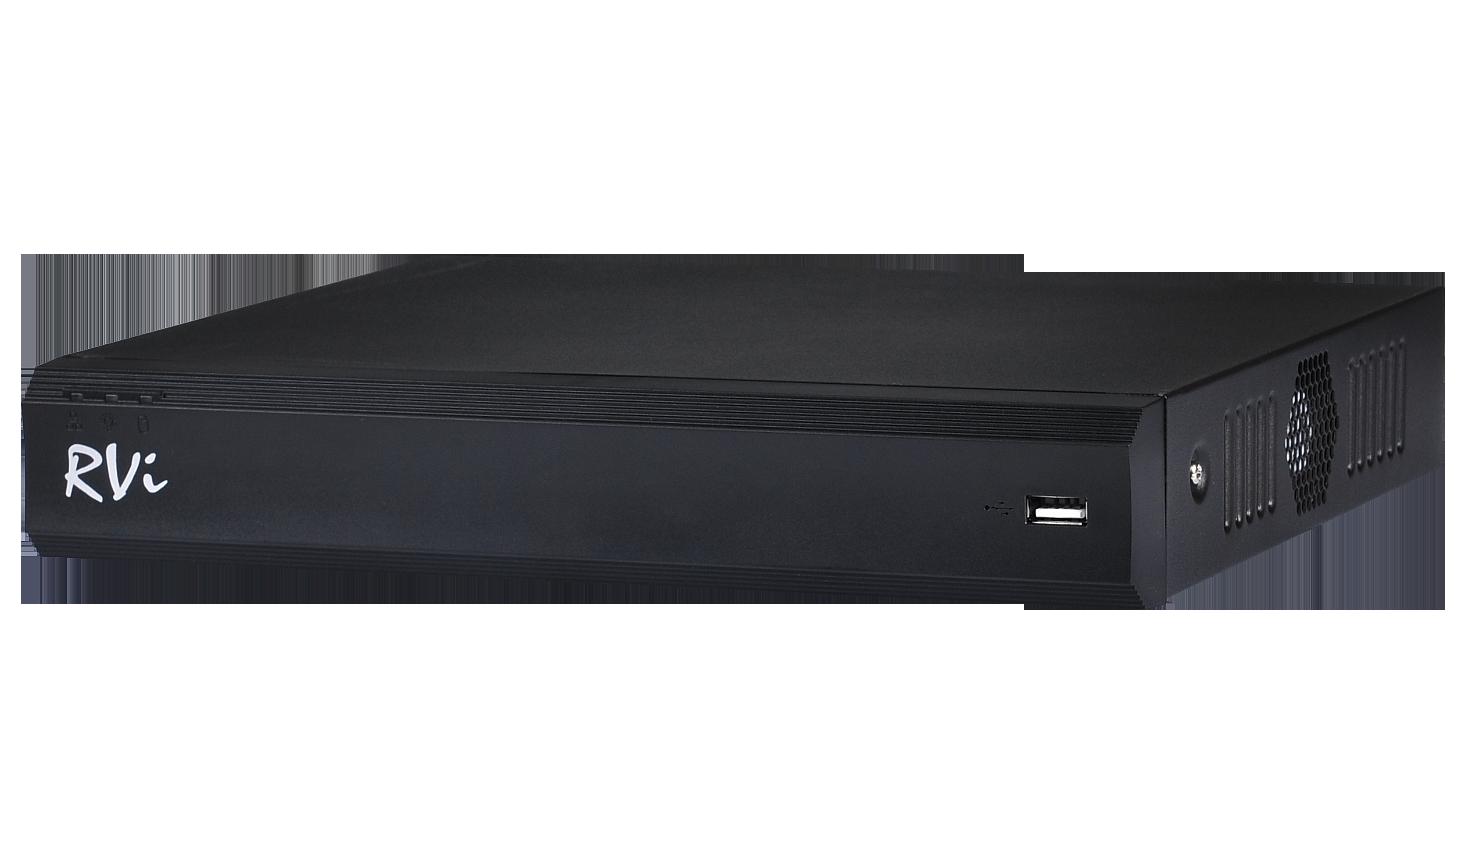 RVi-HDR08LA-C V.2